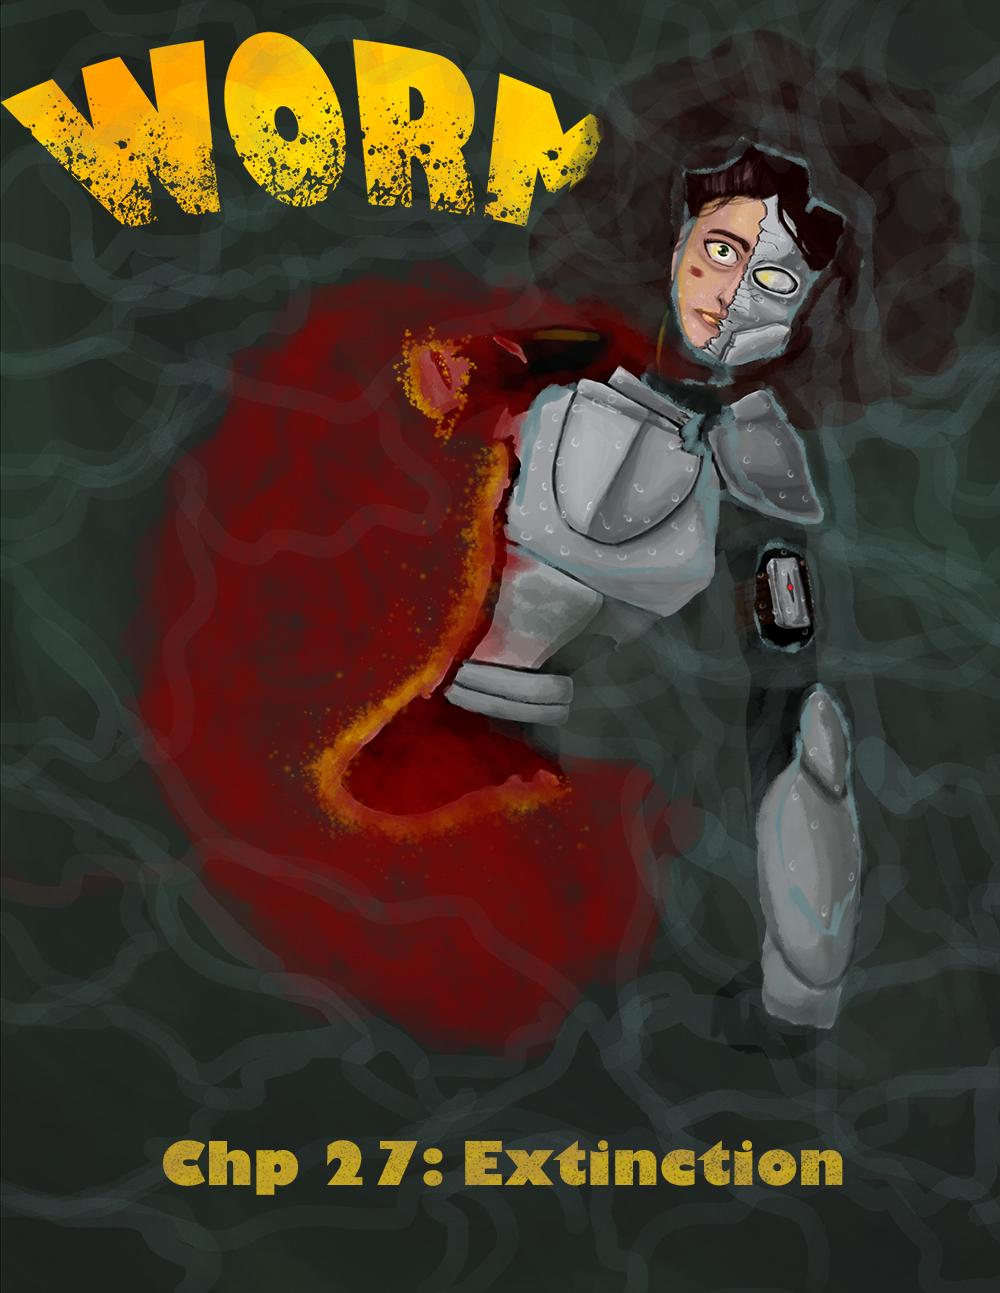 Worm Chapter 27: Extinction by wolfofragnarok